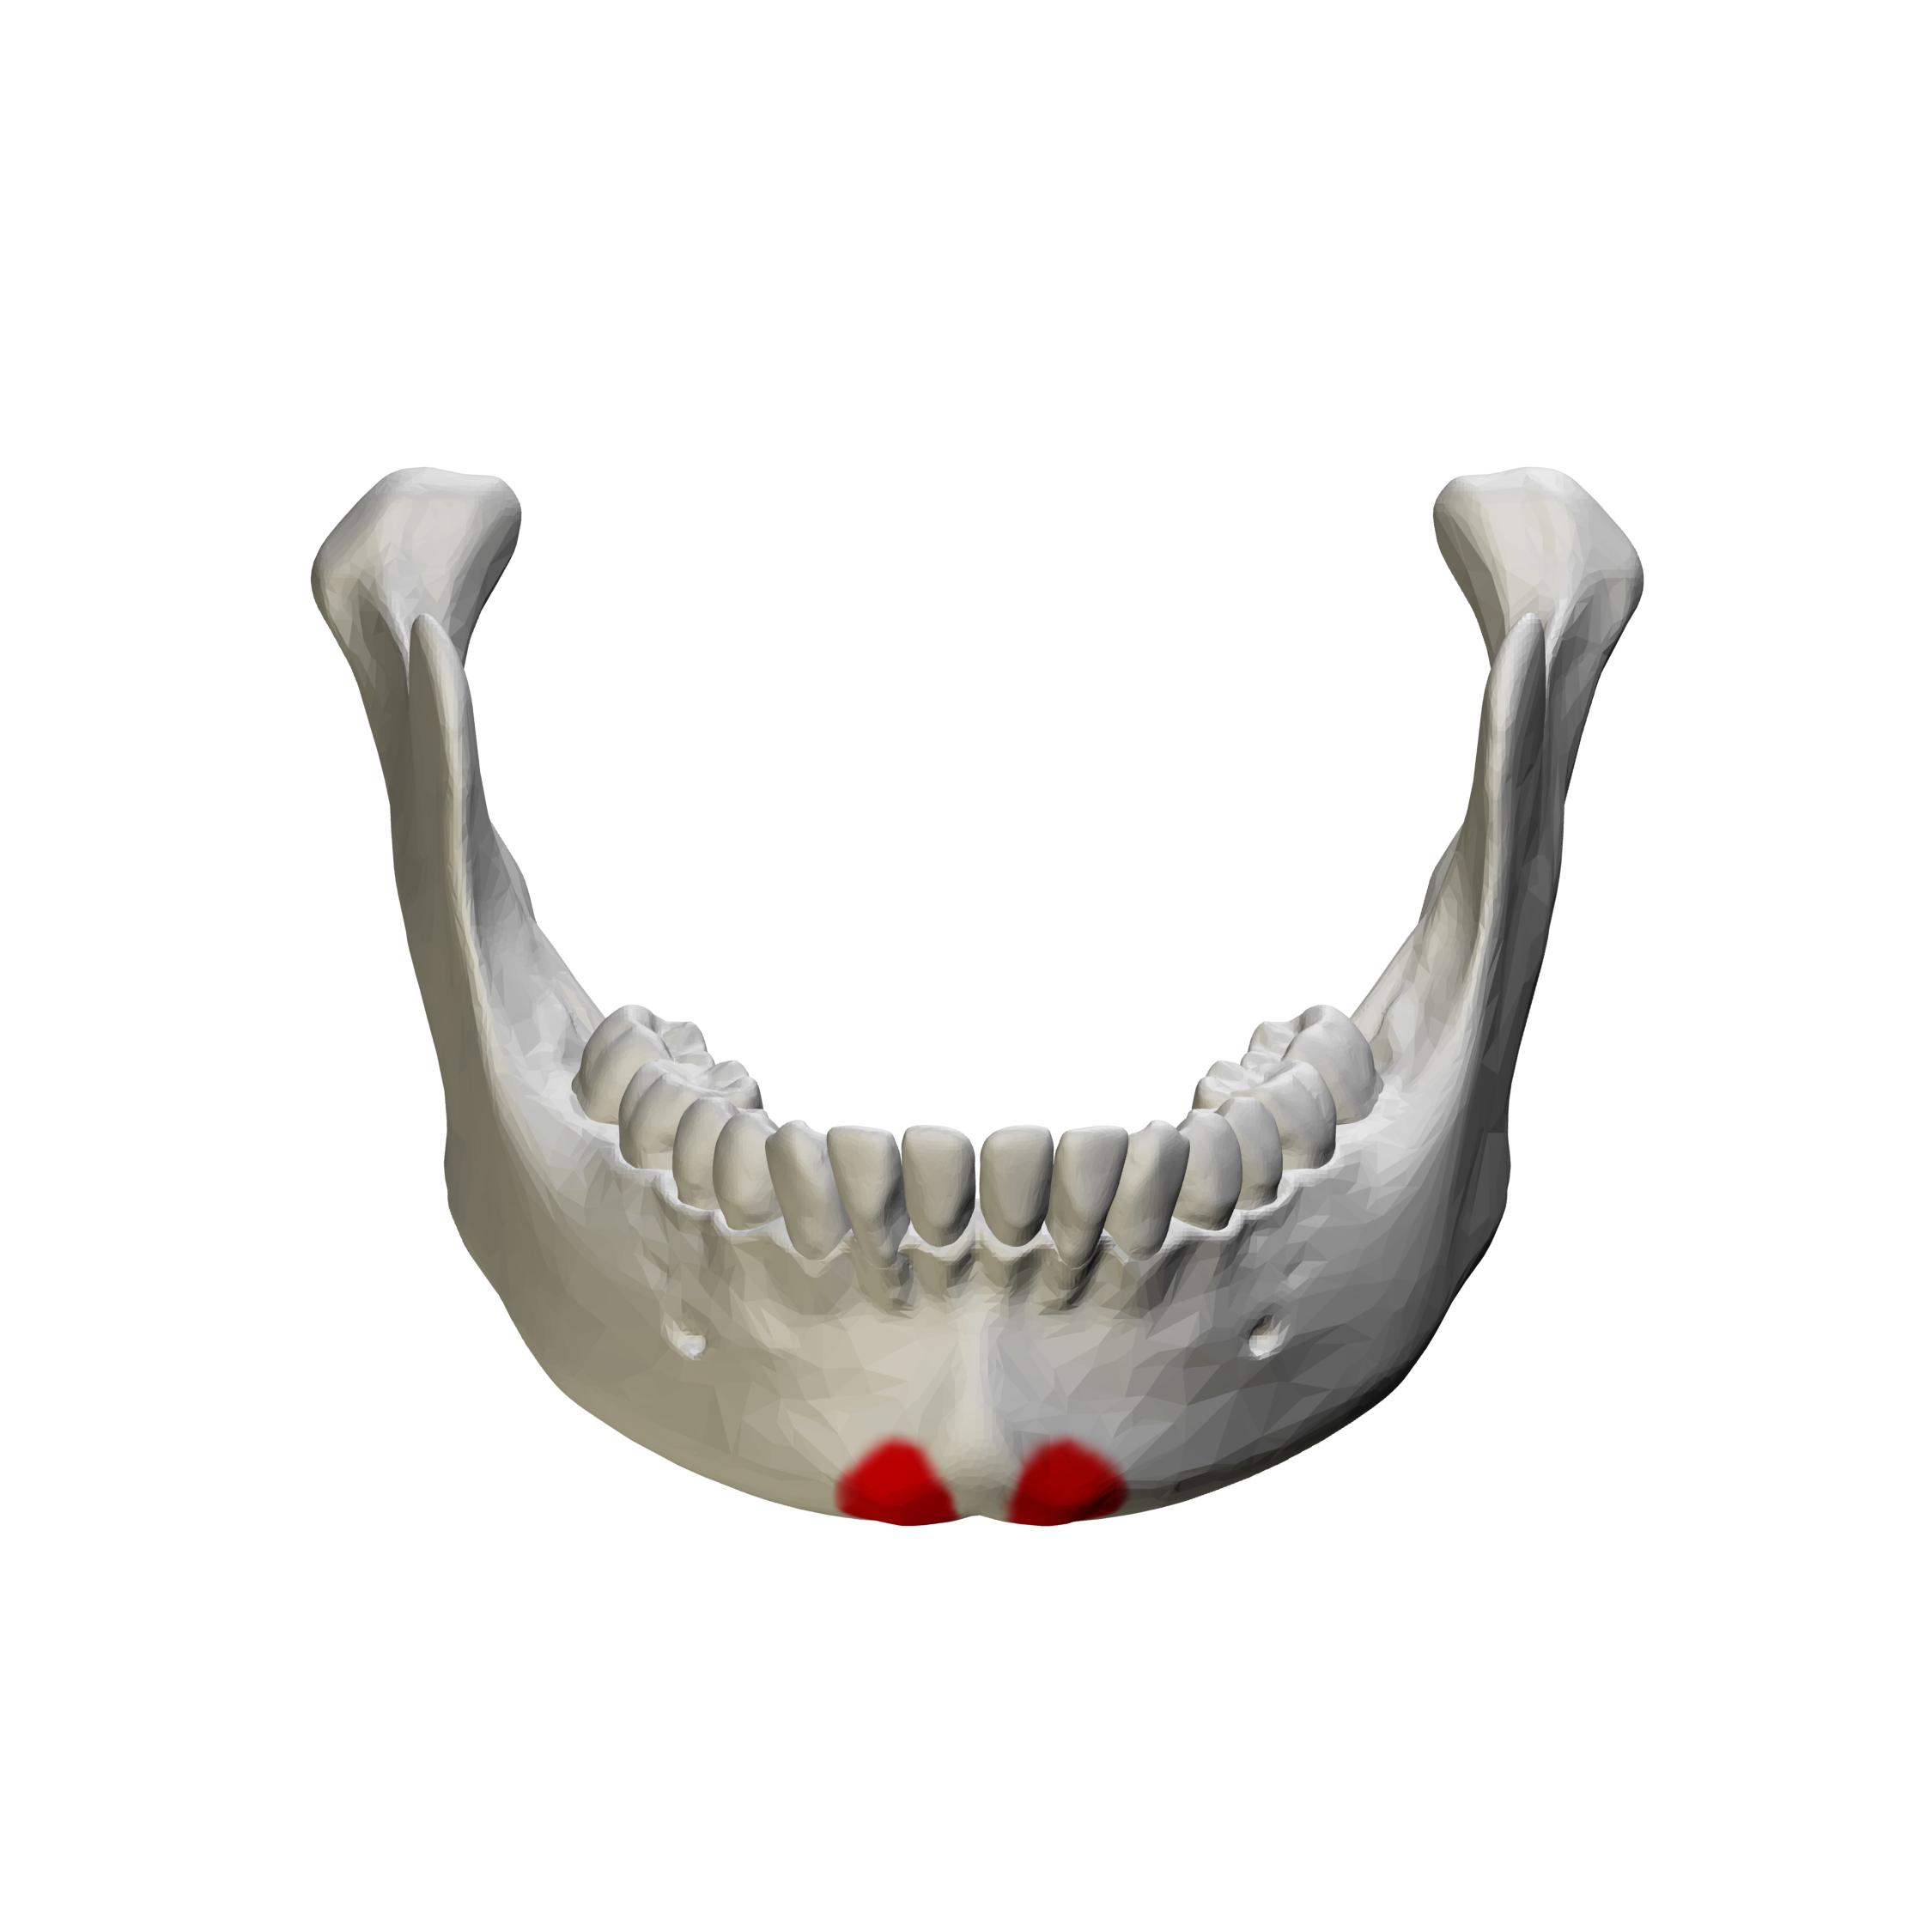 File:Mental tubercle - close up - anterior view01.png ...